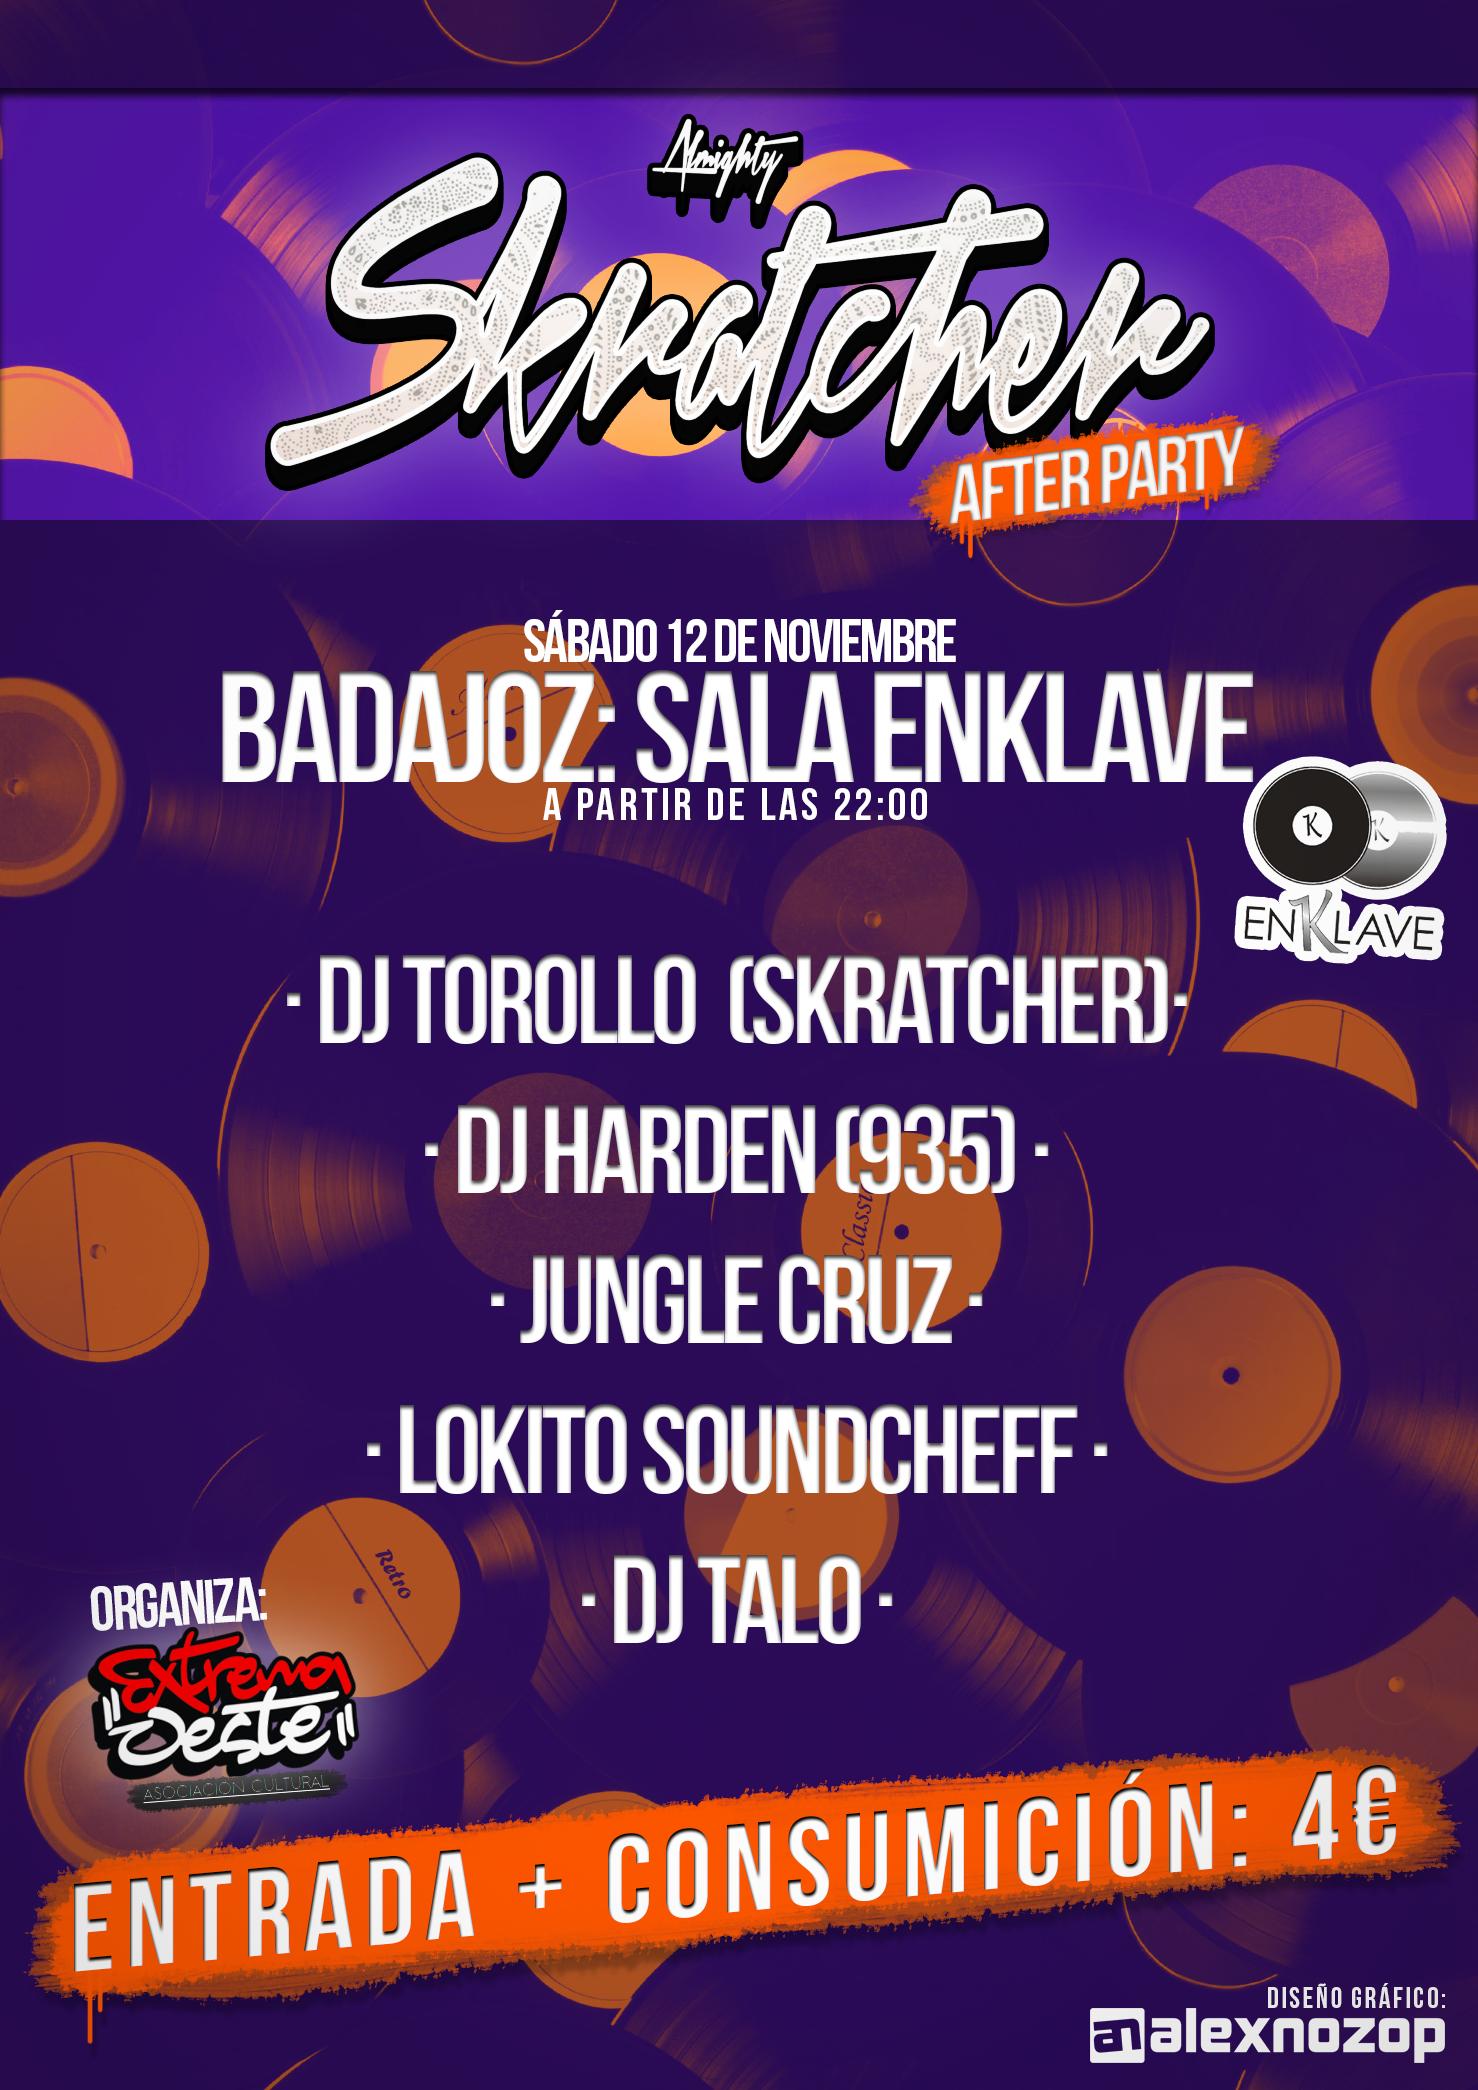 Scratcher party